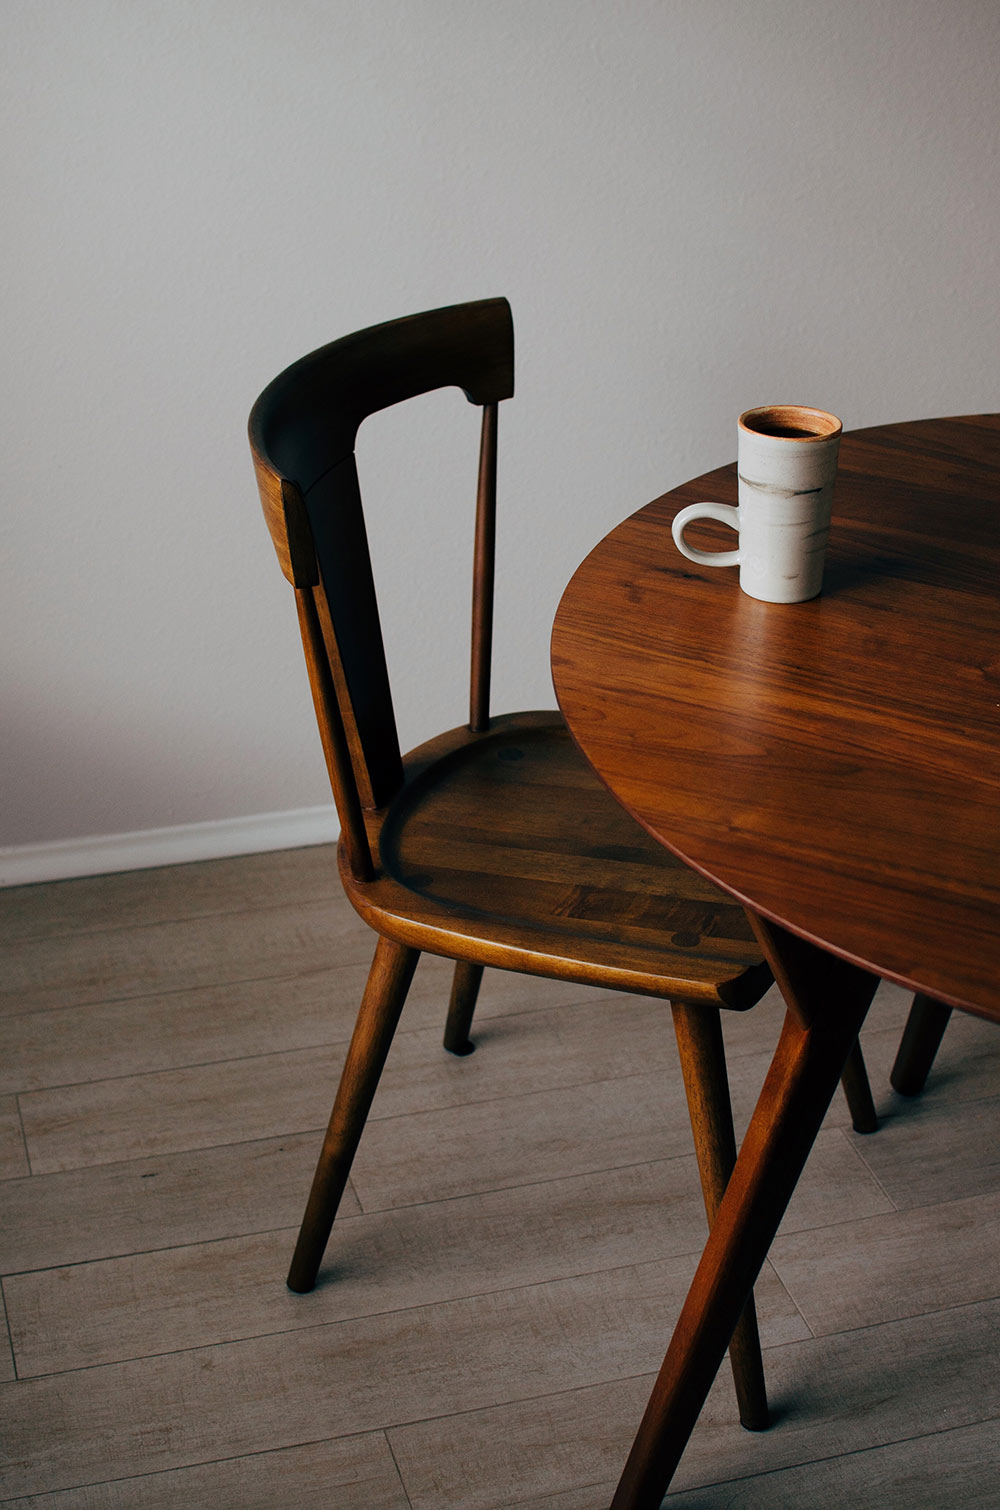 Gu a para limpiar muebles de madera natural megamobiliario - Limpiar muebles de madera ...